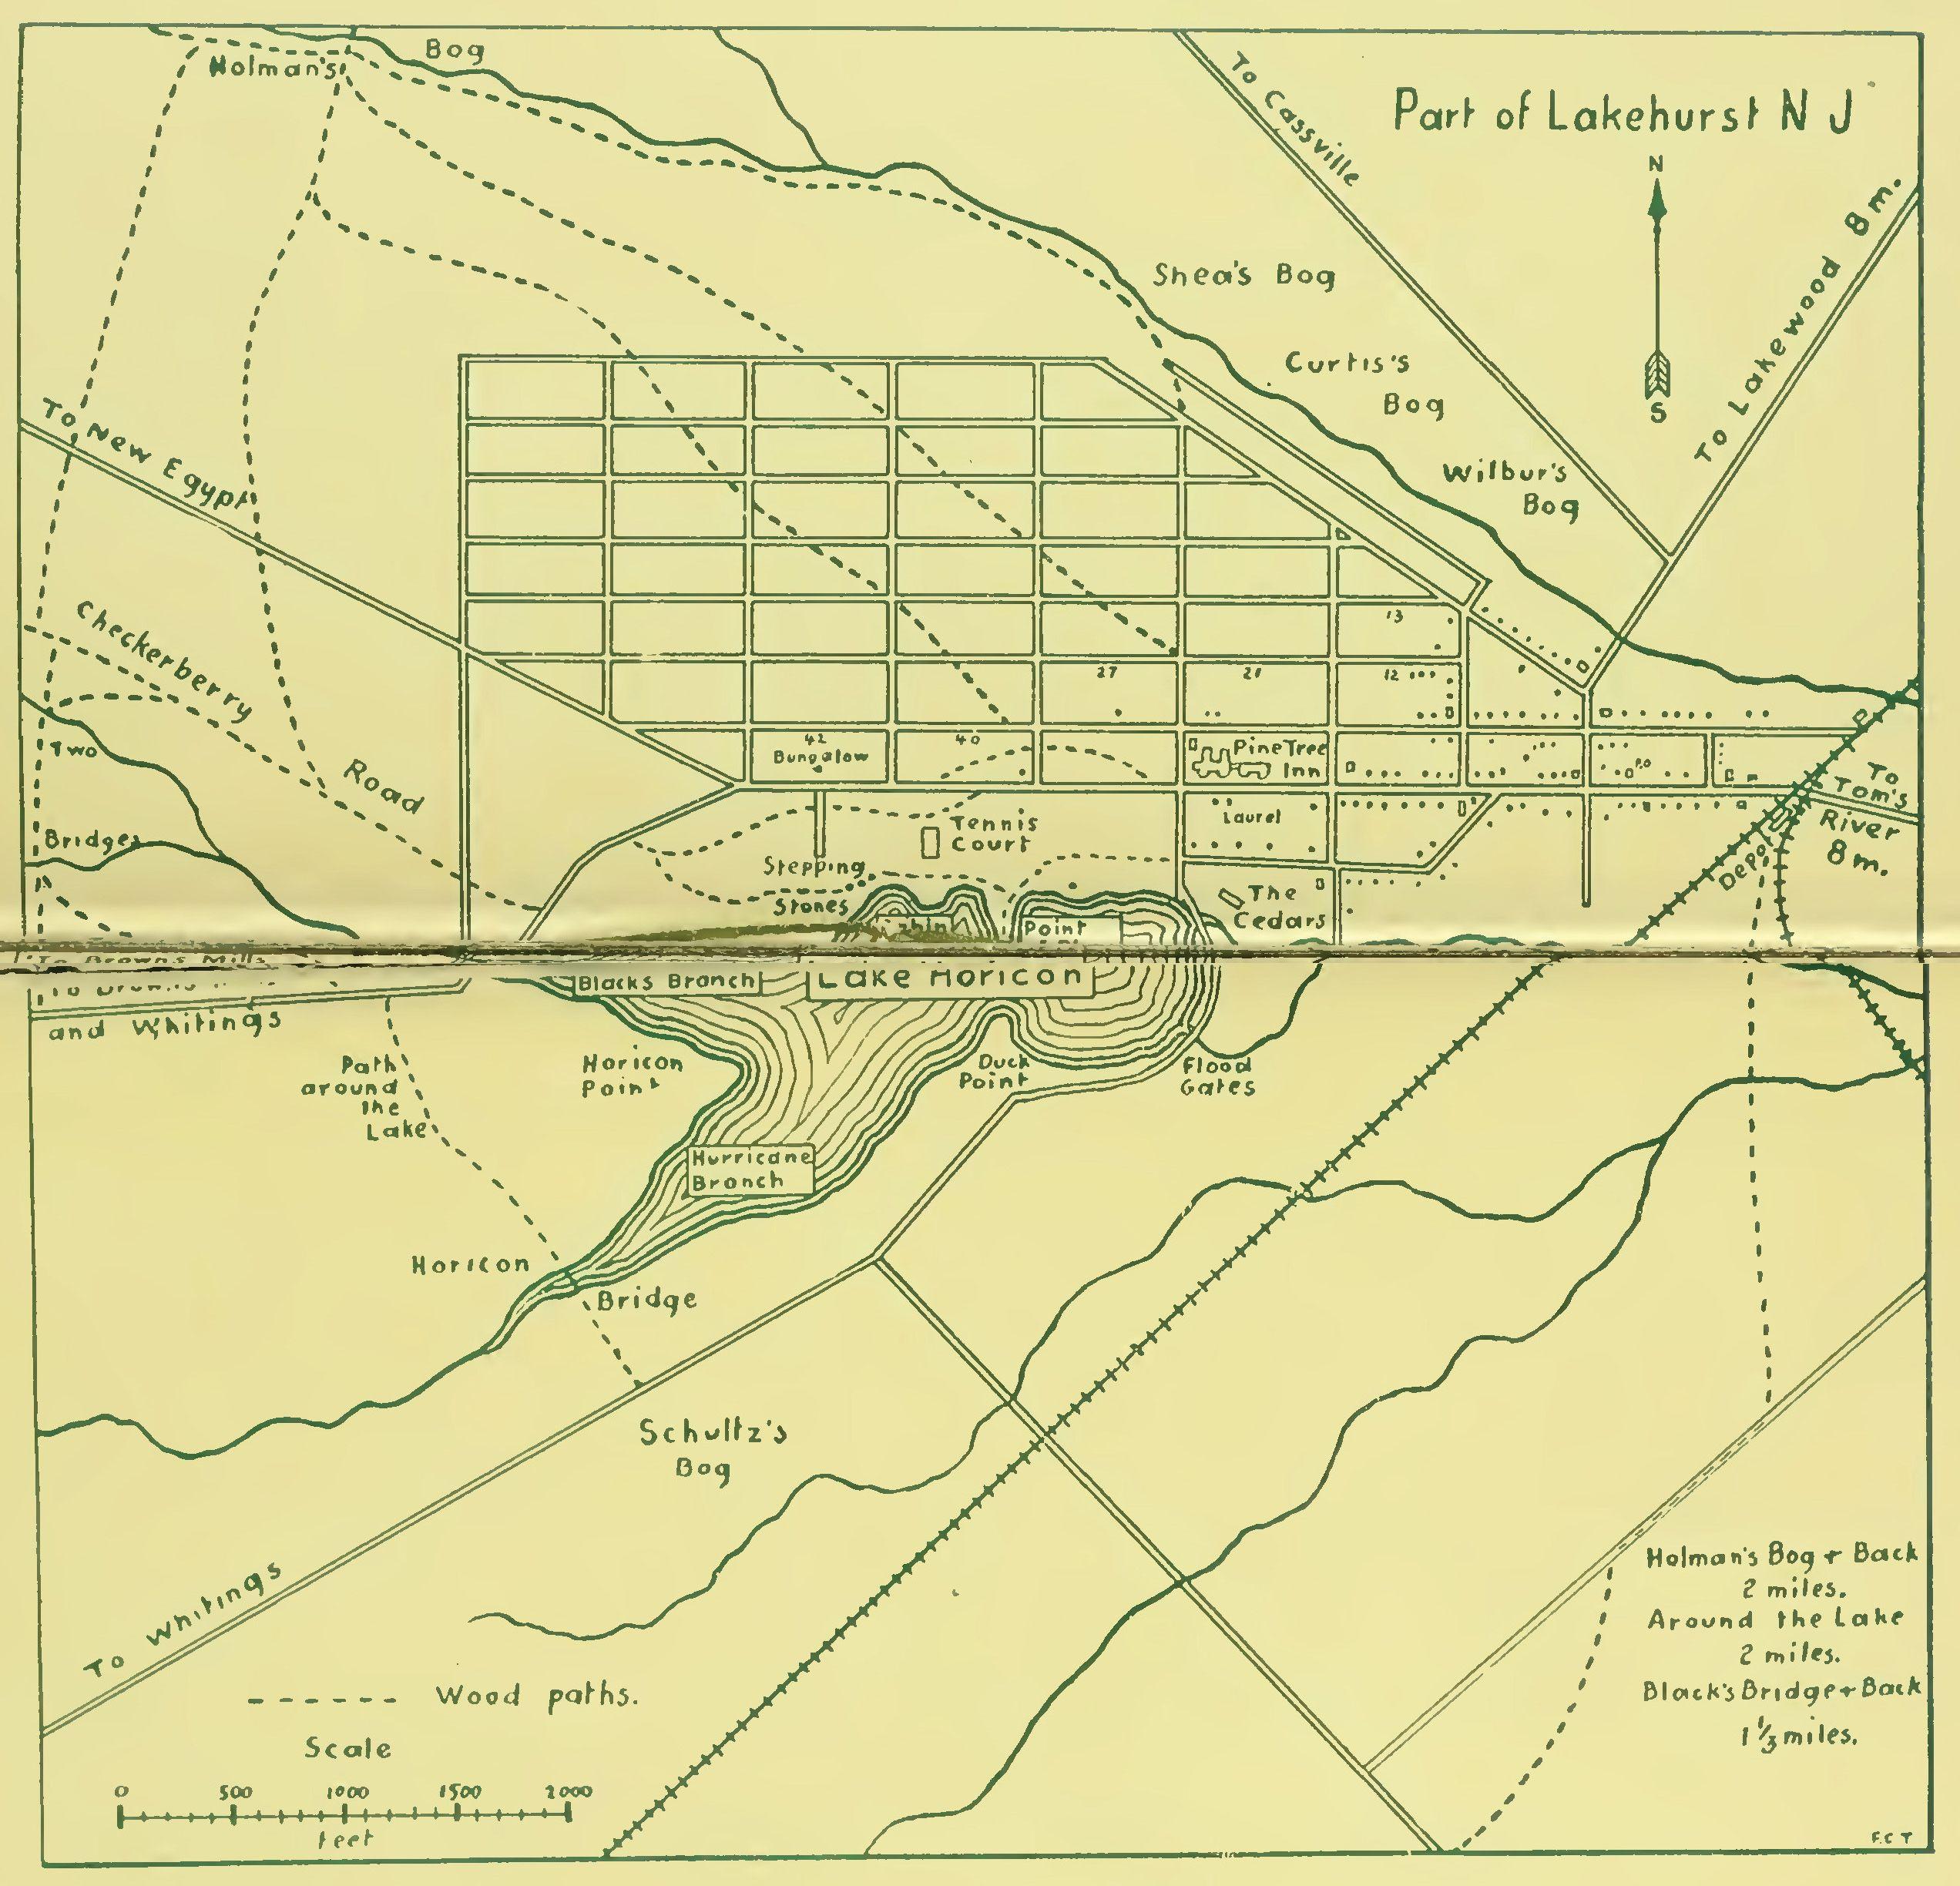 Old Lakehurst, NJ map circa 1908 or so | The Hindenburg, Lakehurst